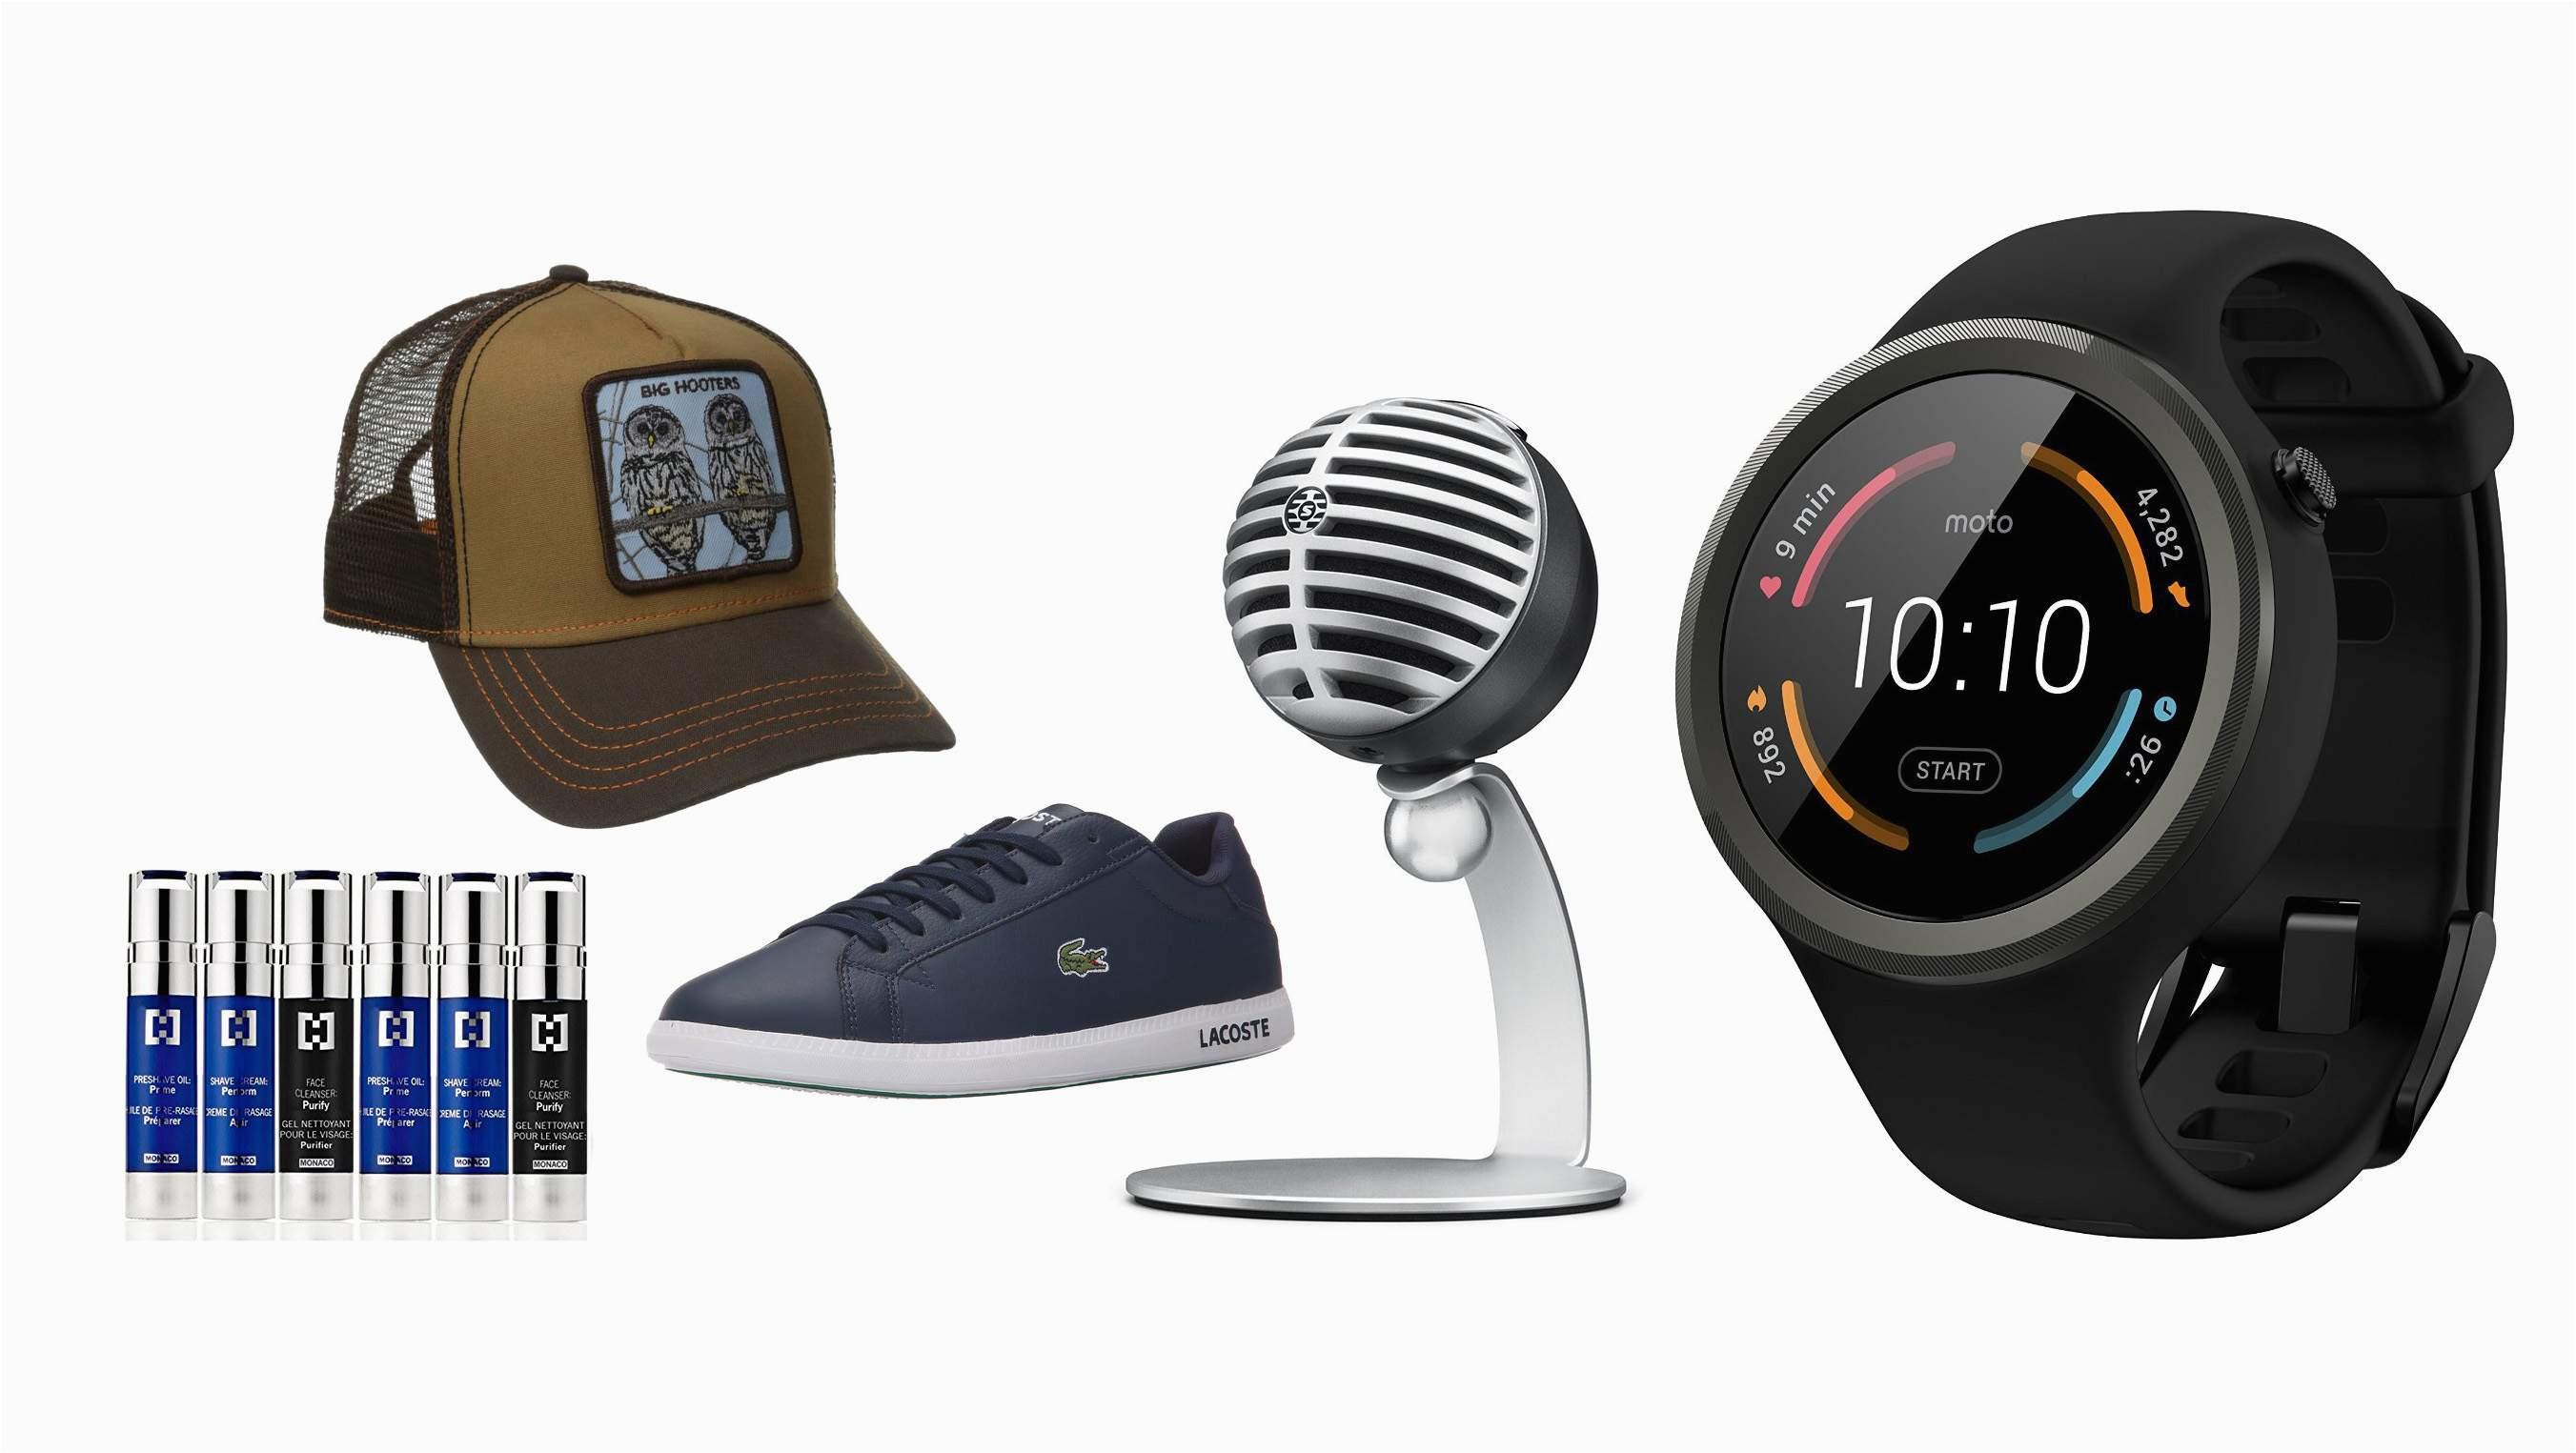 top best birthday gifts for boyfriend gift ideas men him cool unique